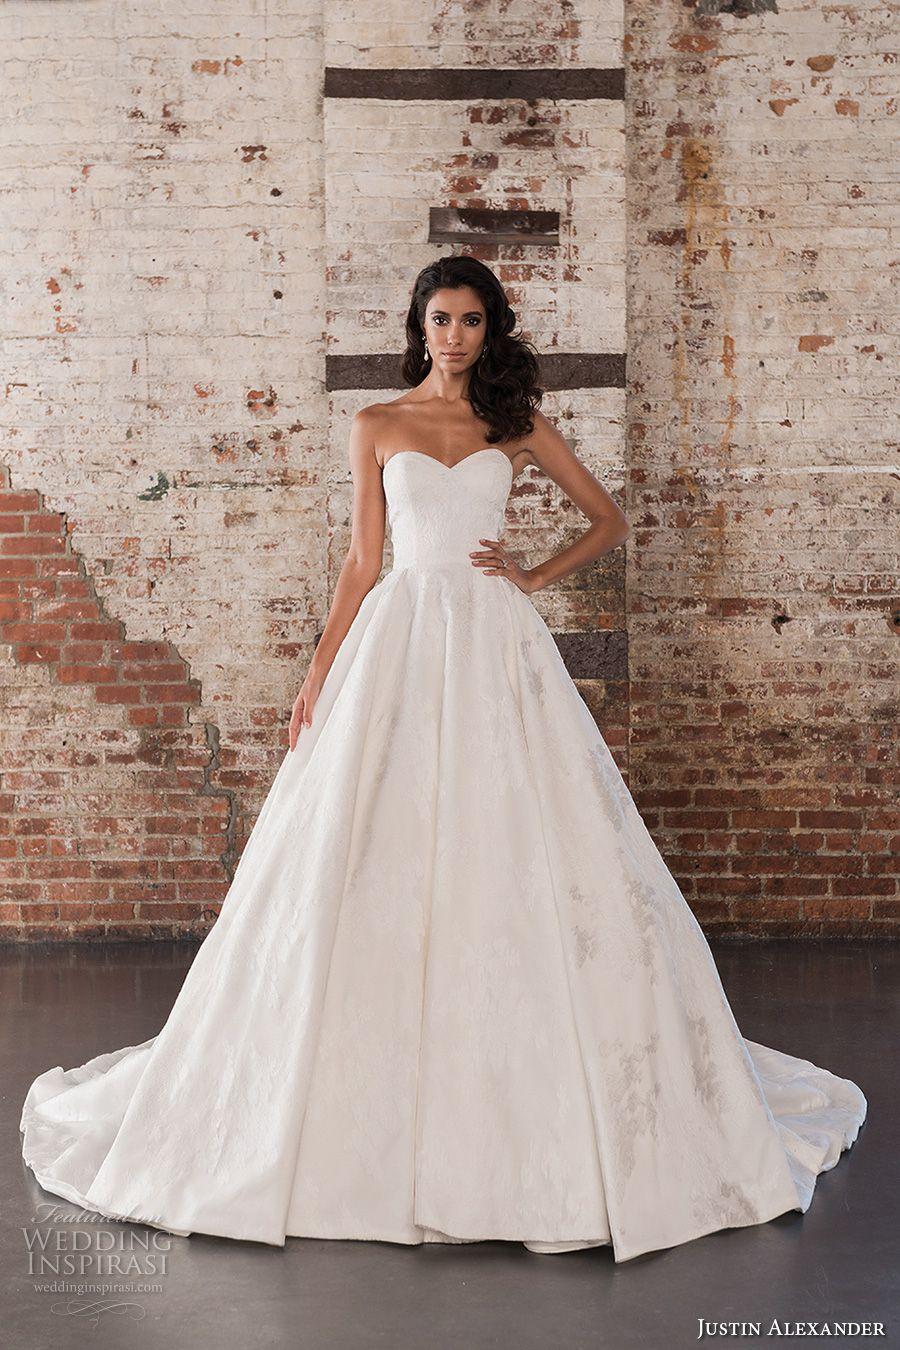 Justin Alexander Signature Spring/Summer 2017 Wedding Dresses ...